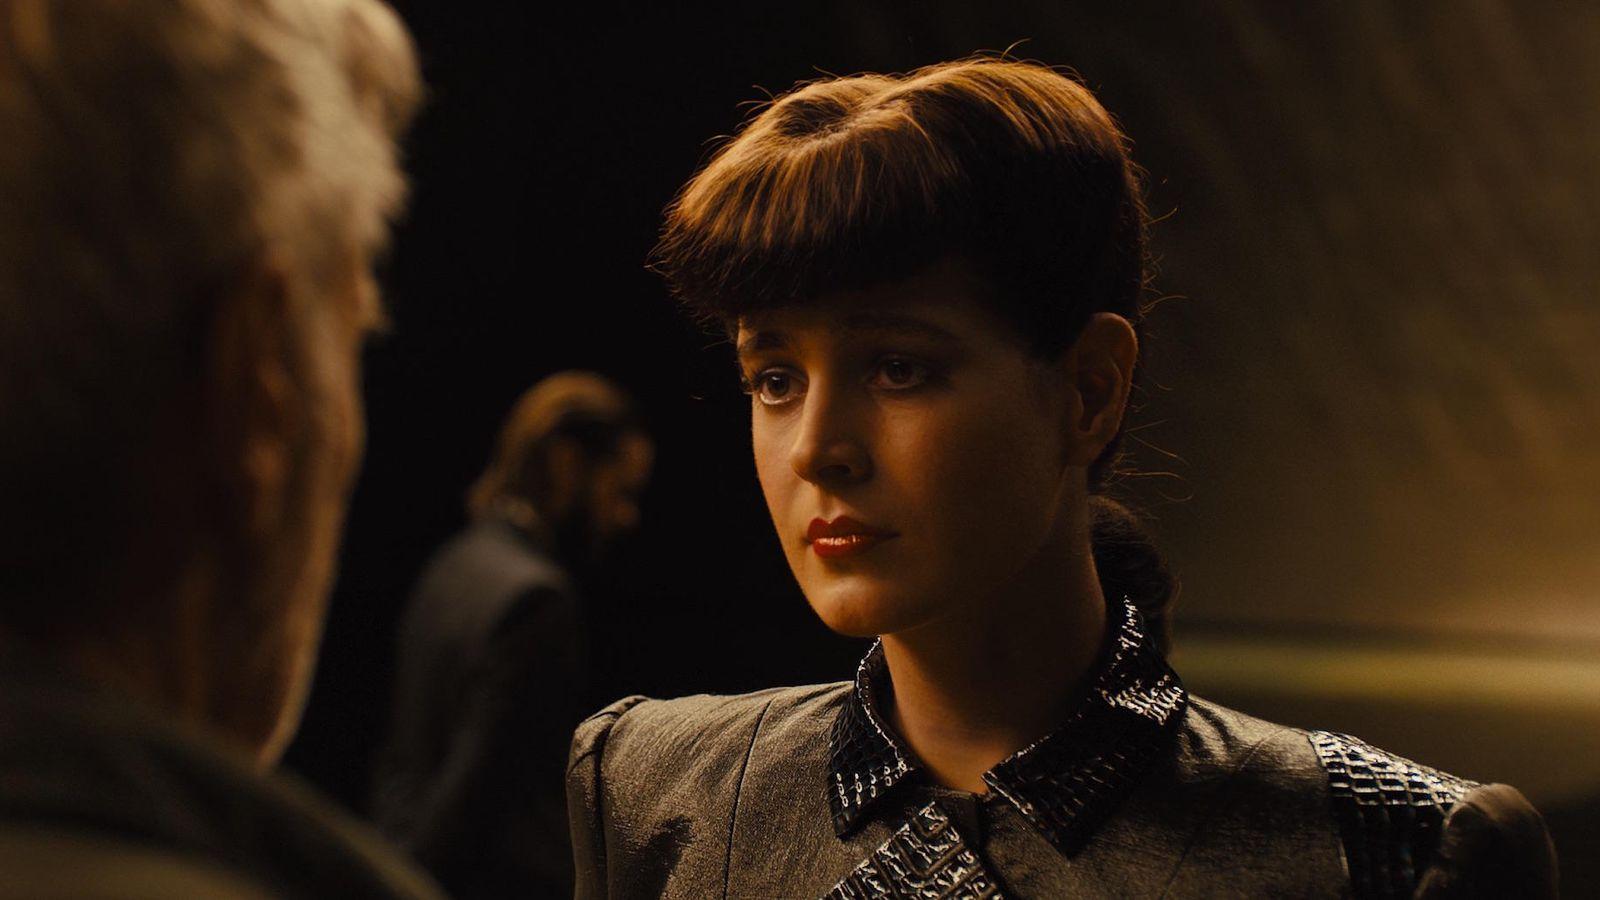 4047a68dfeb6dc The Film Connoisseur: Blade Runner 2049 (2017)